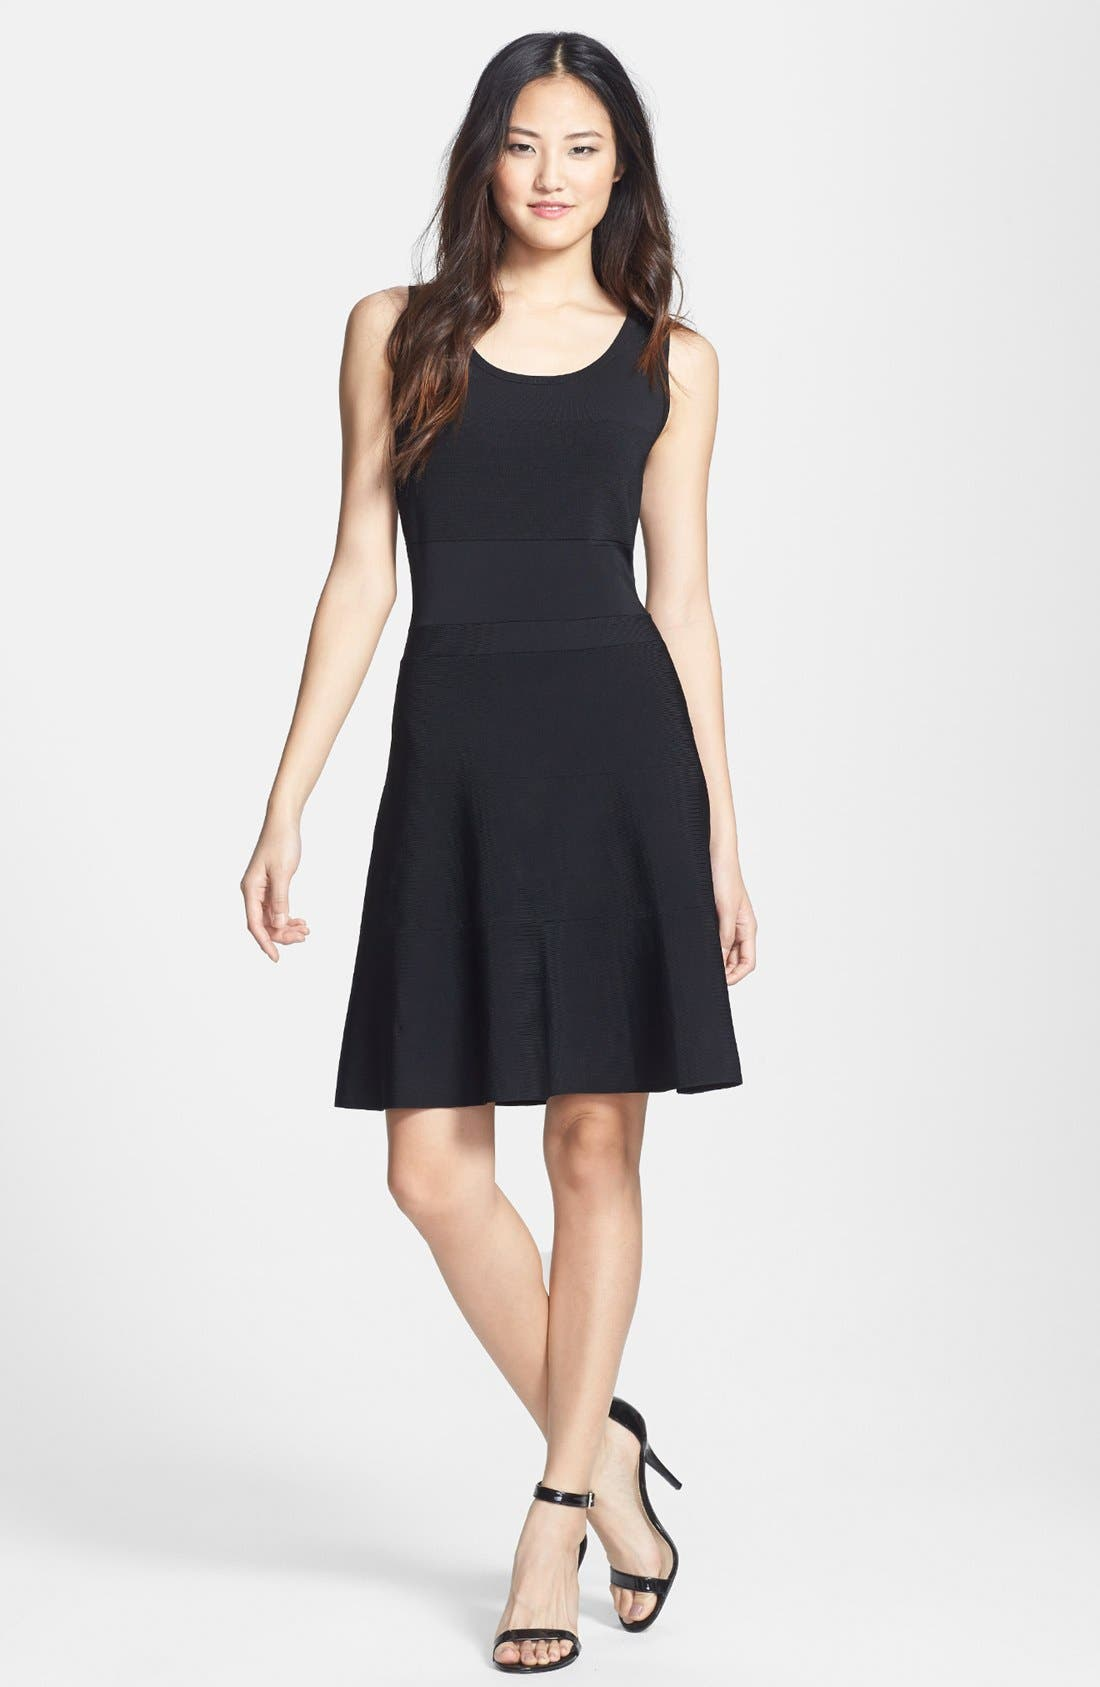 Alternate Image 1 Selected - Halogen® Sleeveless Sweater Knit Dress